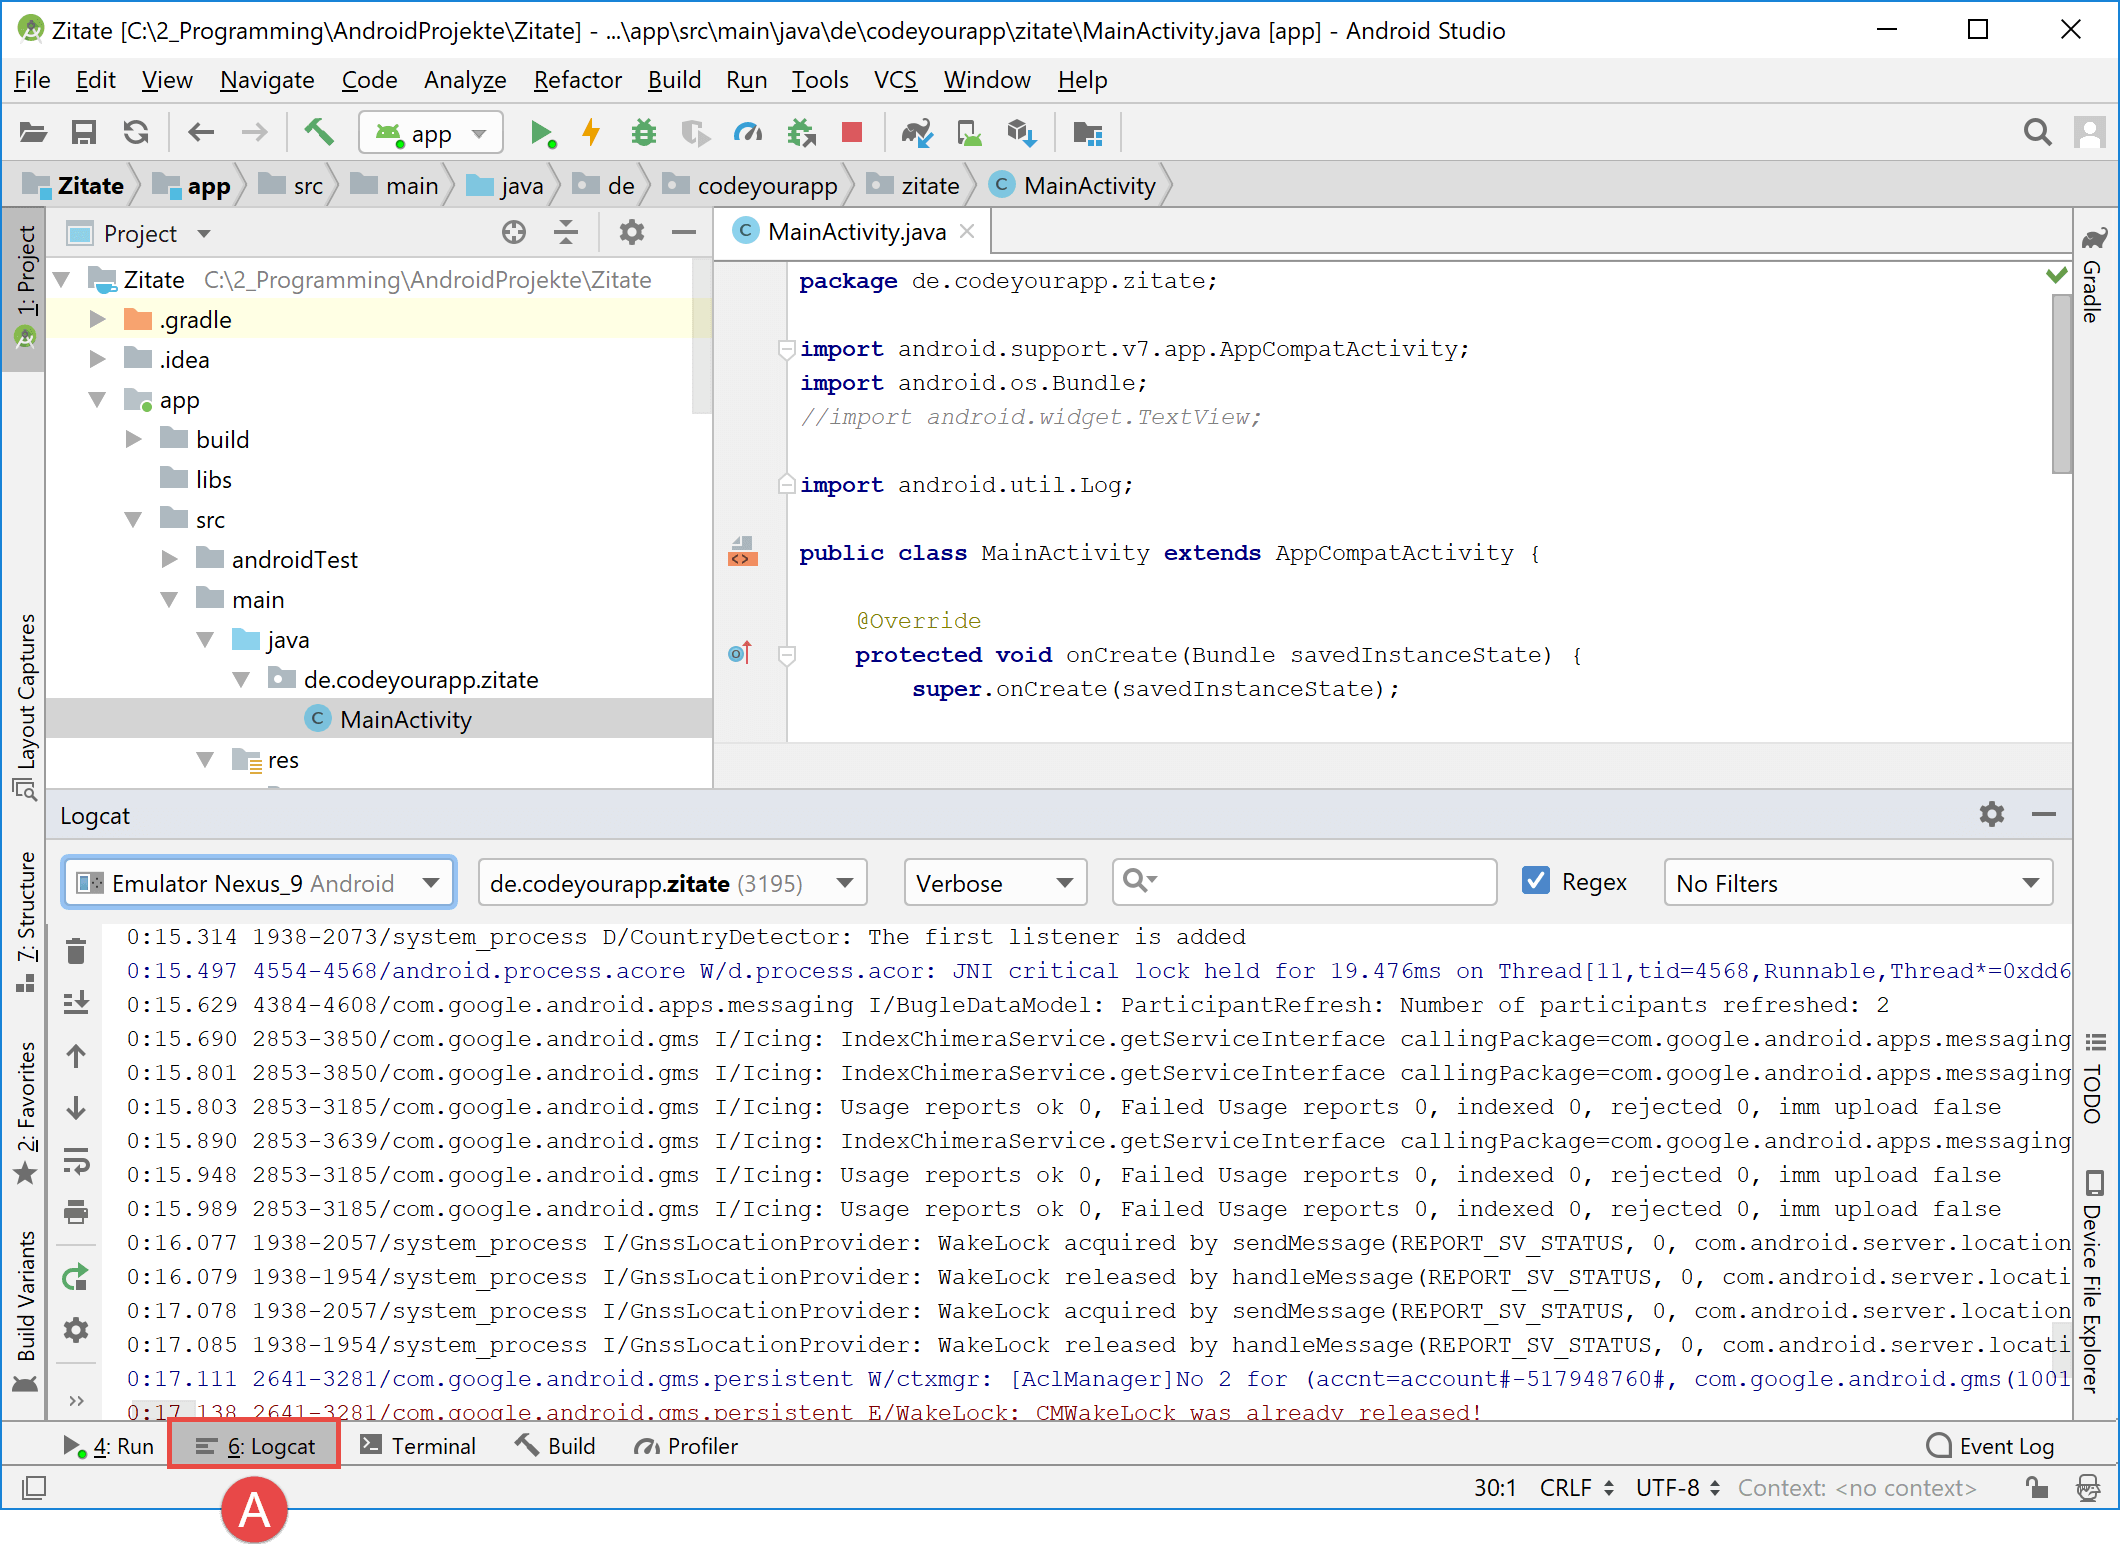 logcat_tool_window_open_2a